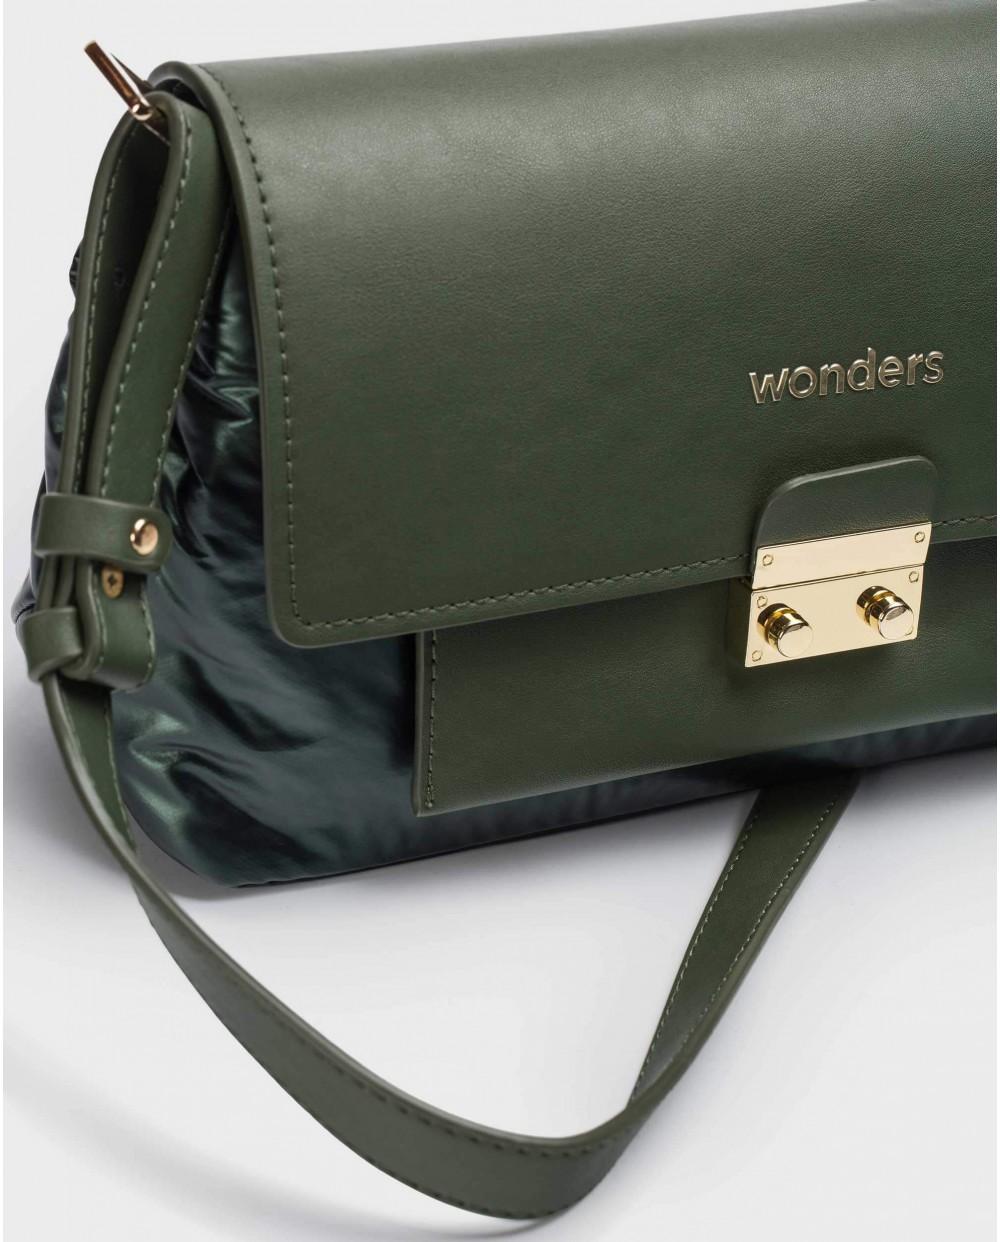 Wonders-Bolsos-Bolso Zenda Verde